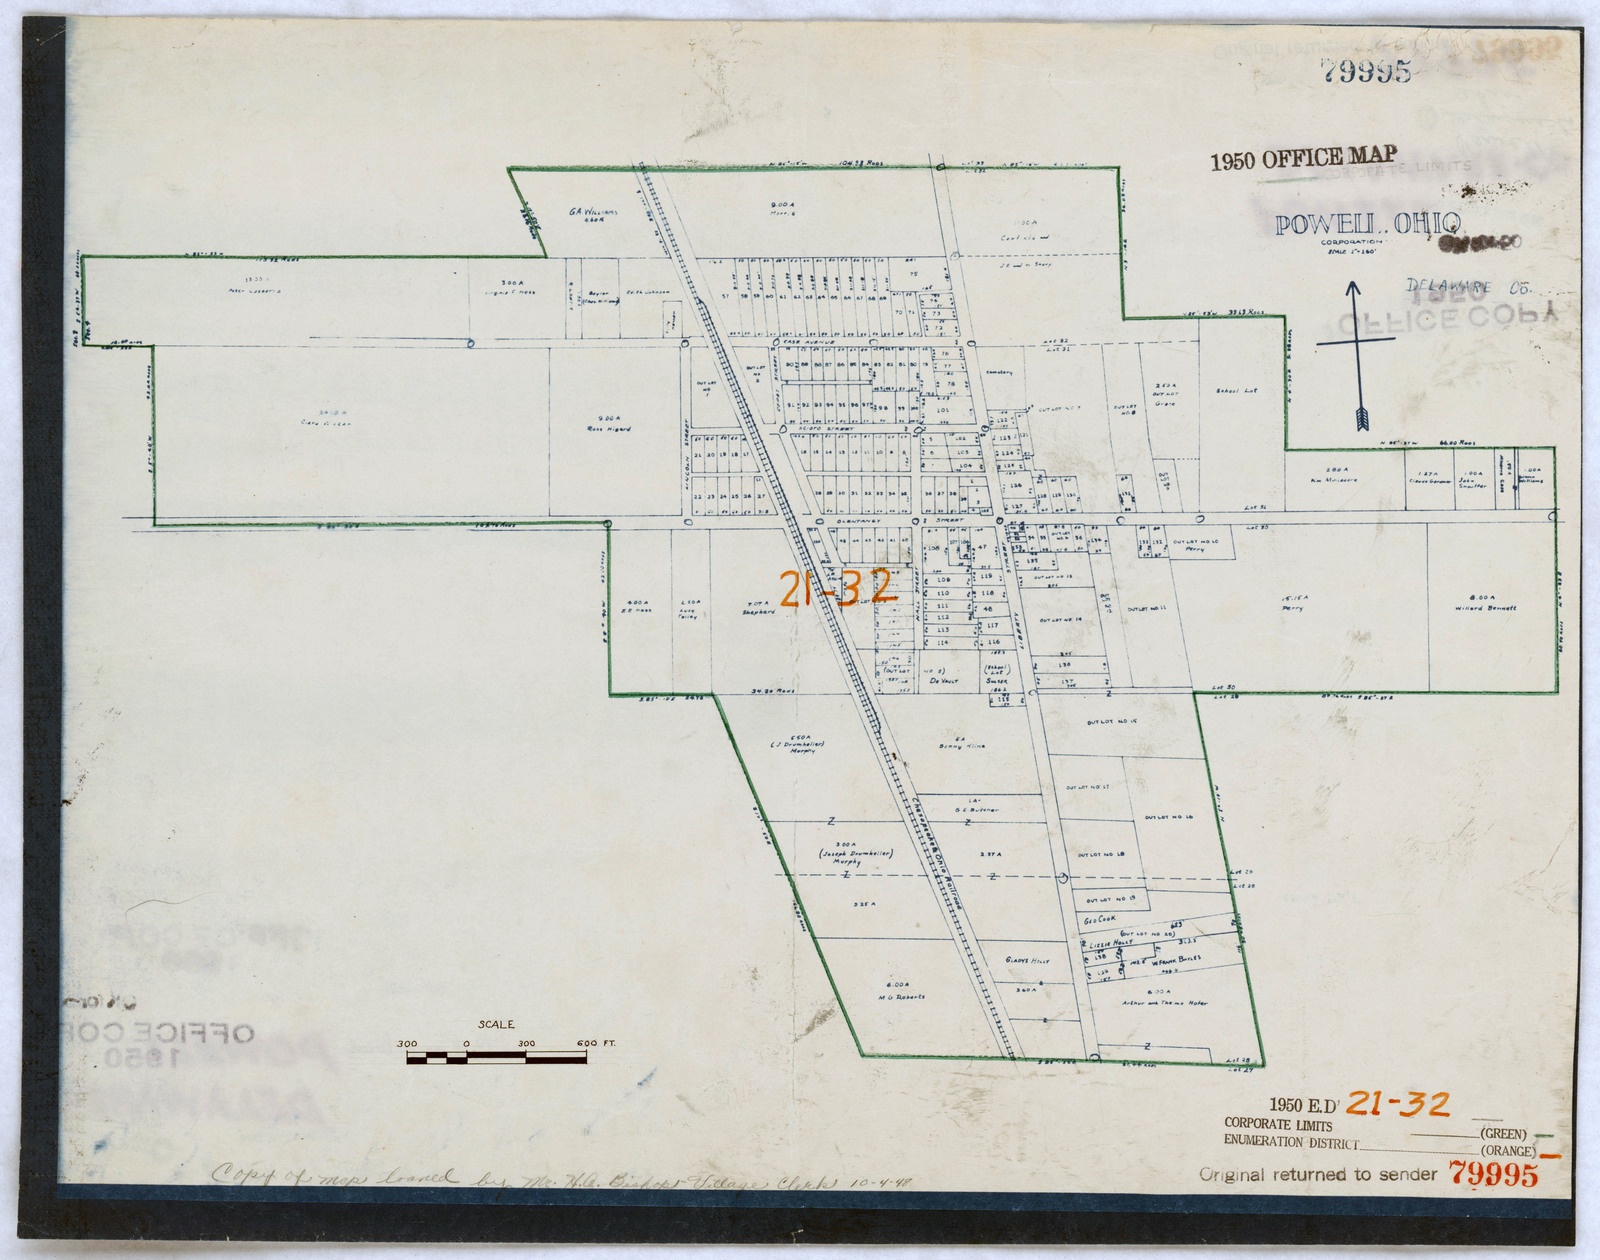 1950 Census Enumeration District Maps Ohio Oh Delaware County